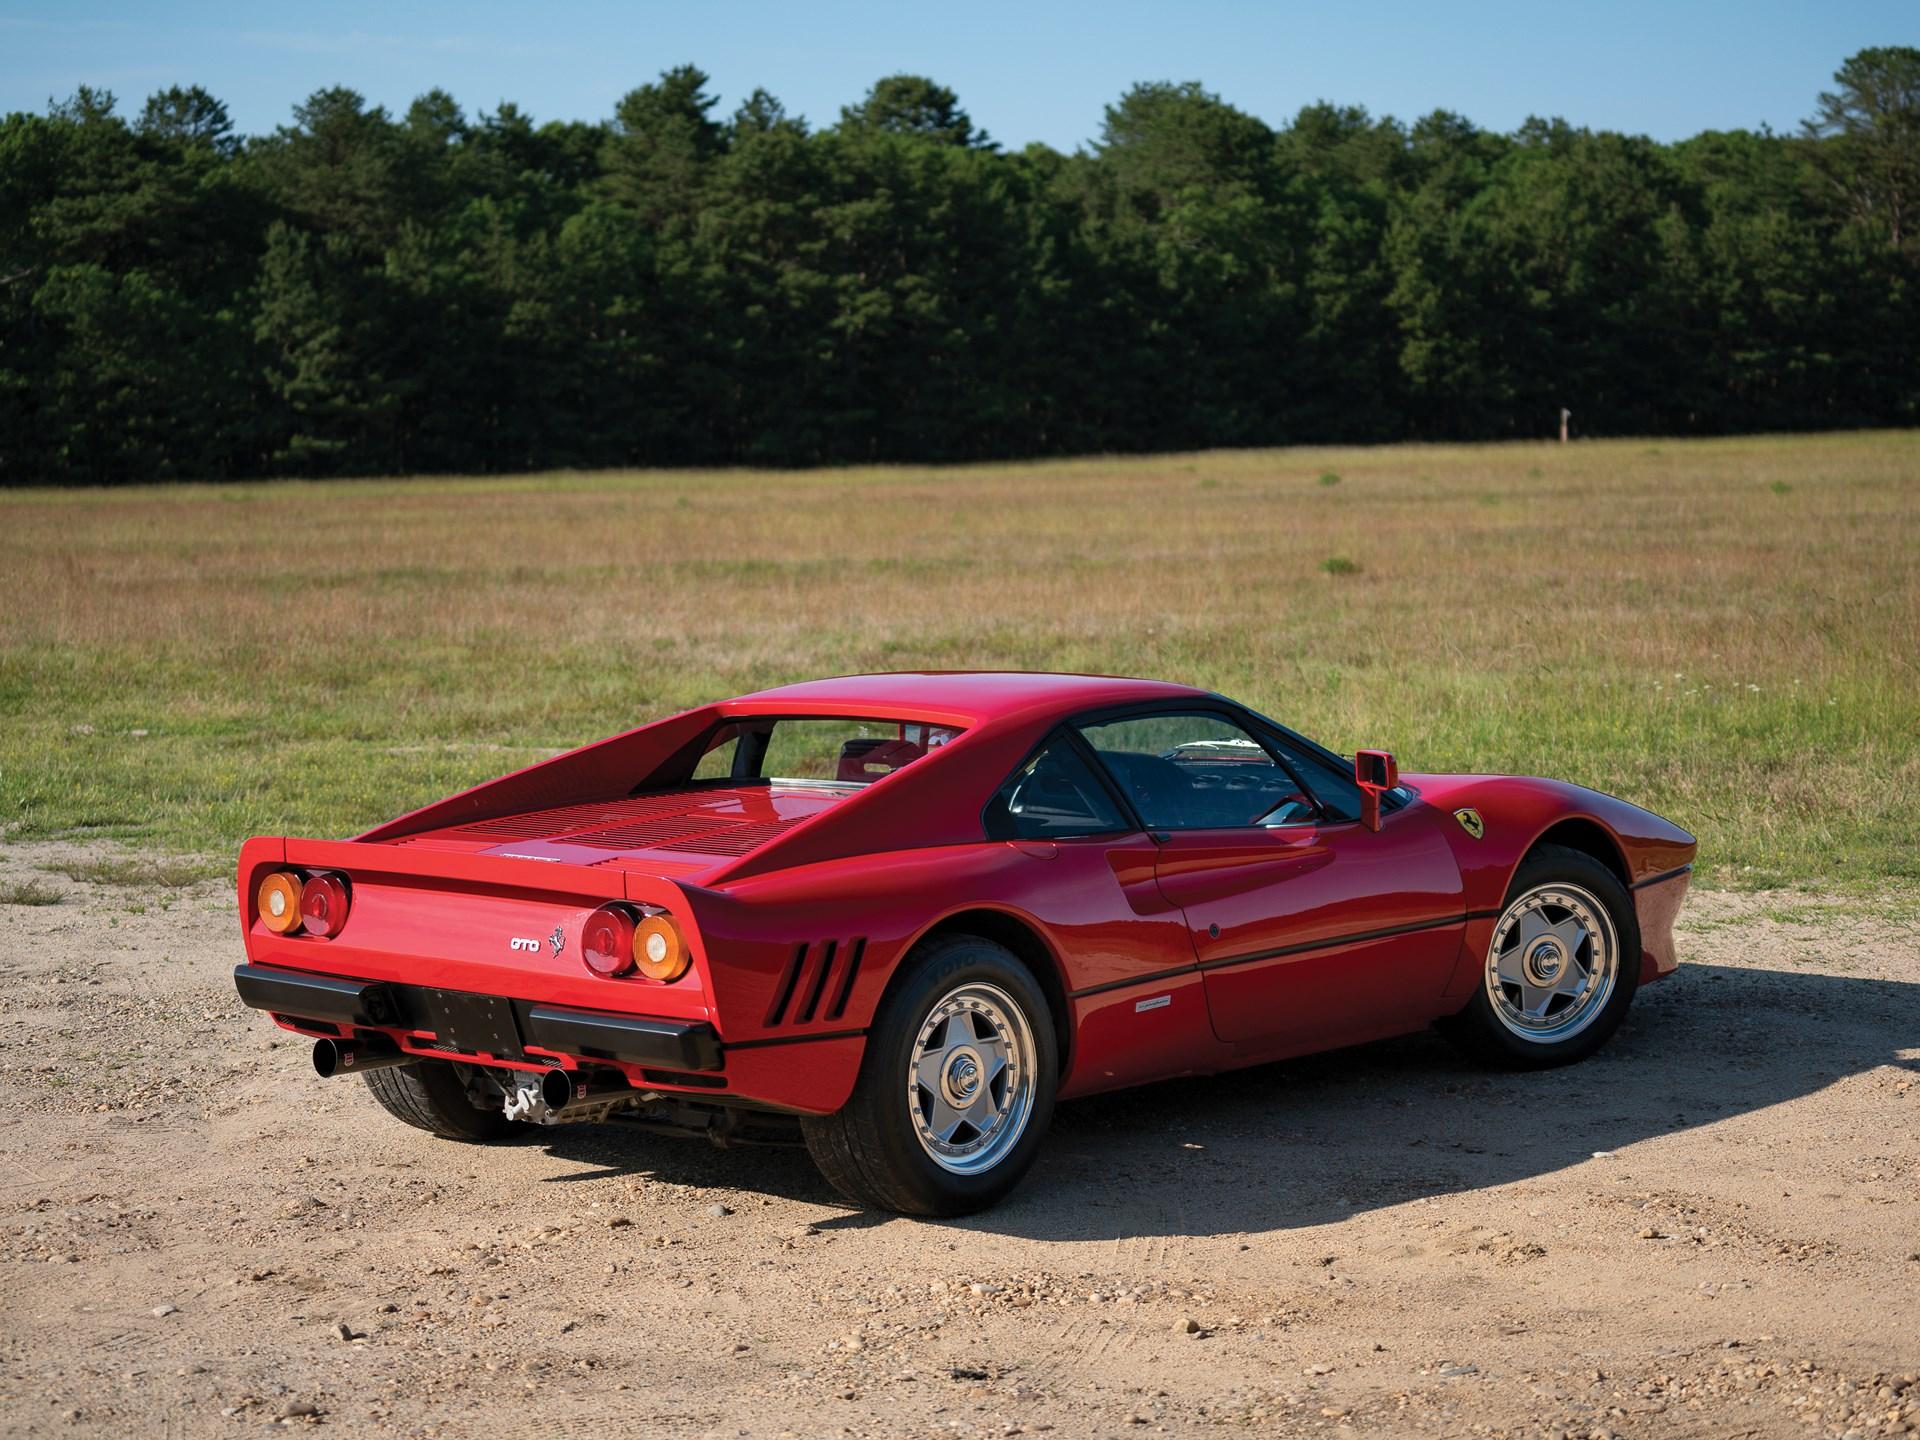 RM Sotheby's - 1985 Ferrari 288 GTO